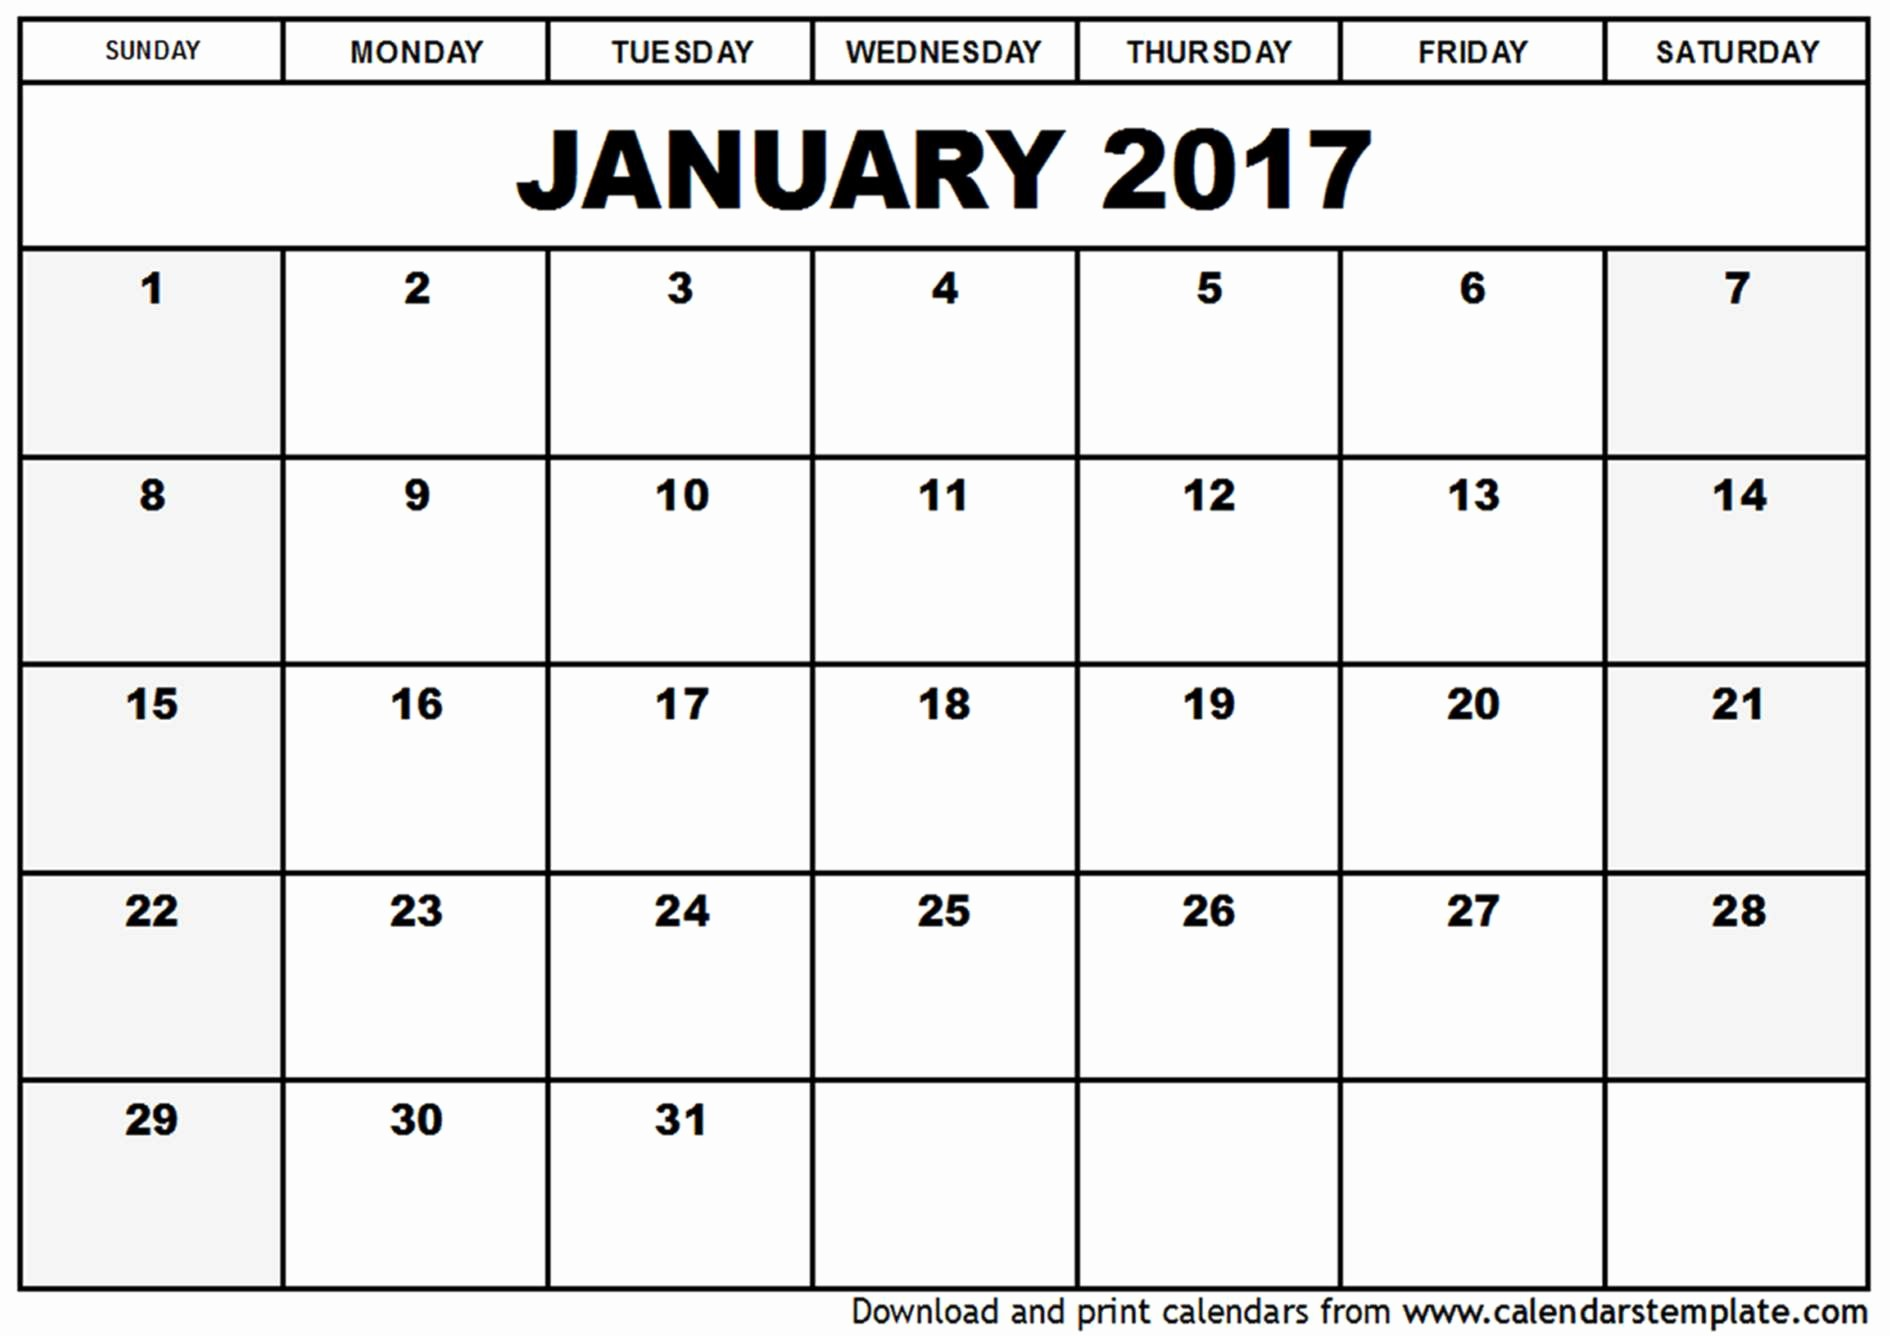 Free 2017 Yearly Calendar Template Luxury Free Calendar Template 2017